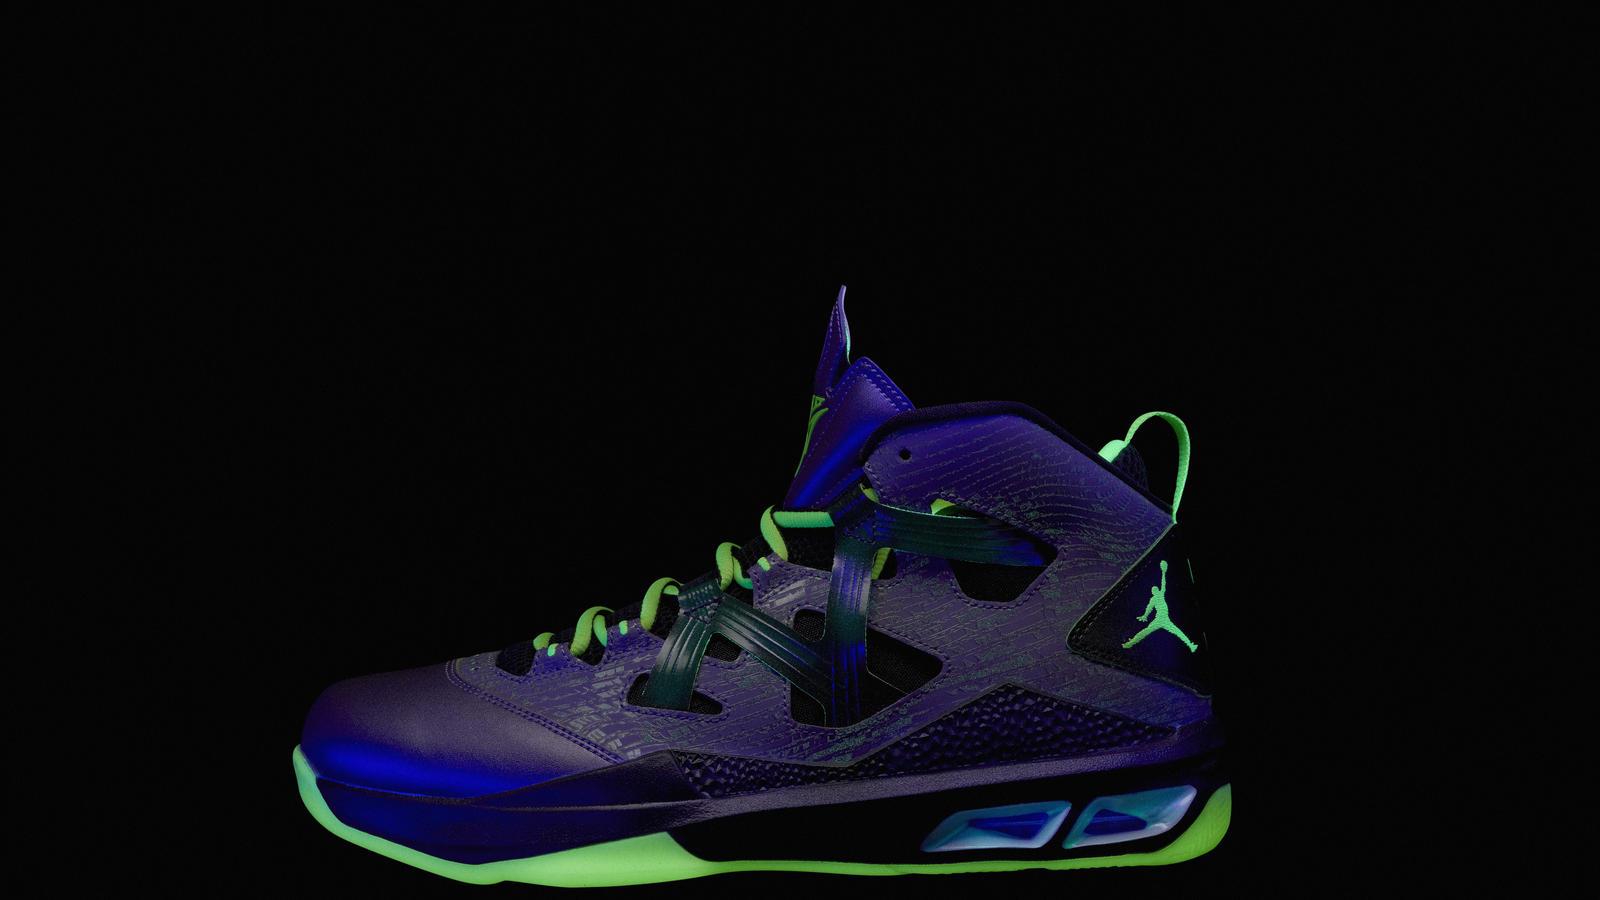 Jordan_2013_AllStar_Ftwr_MELO_LAT_Glow_blk